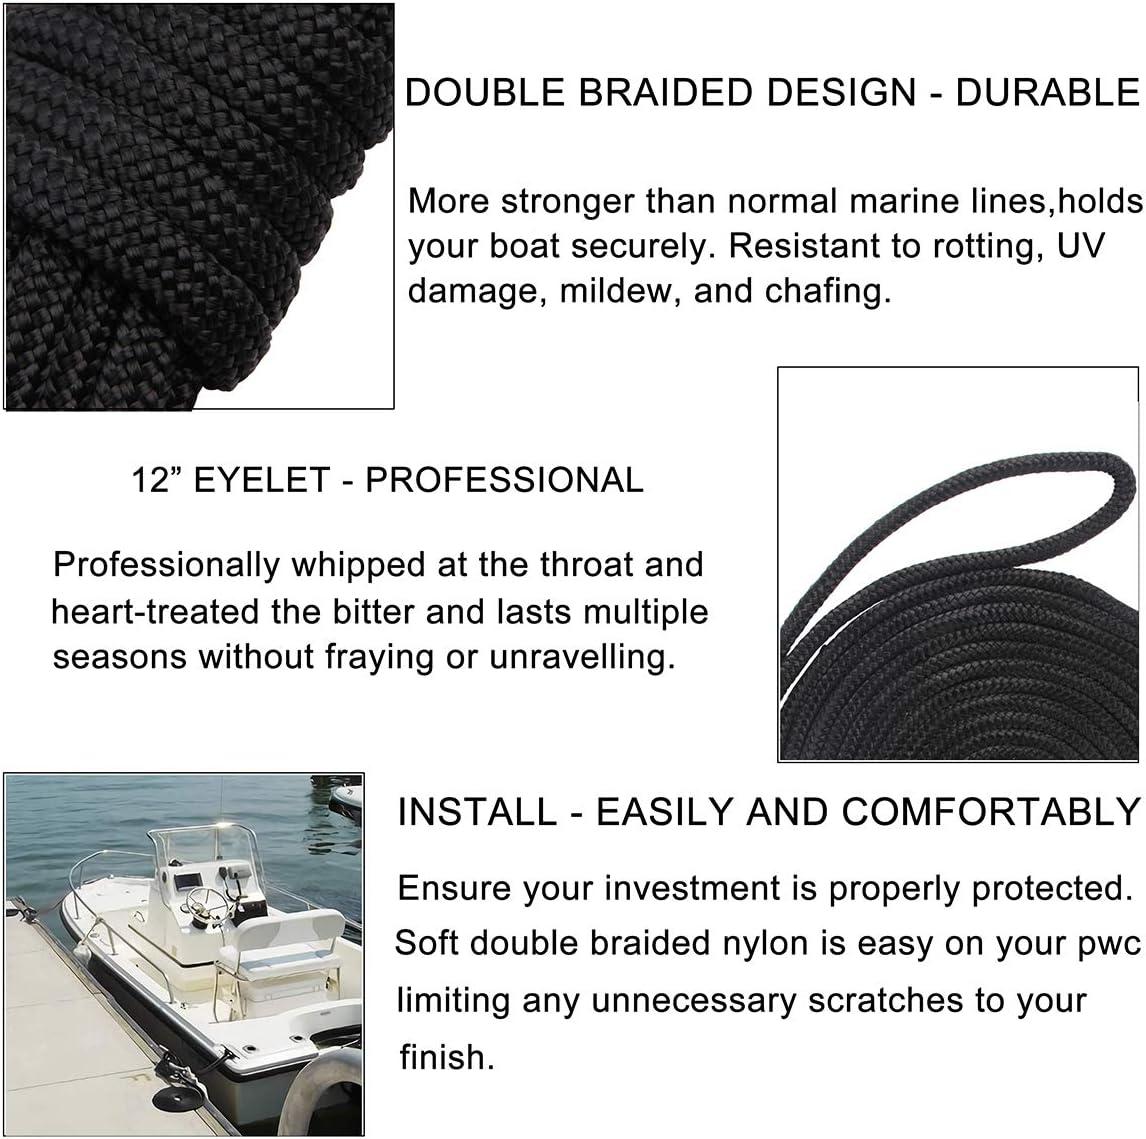 Mooring Rope 12 Eyelet Boat Ropes Marine Rope Premium Boating Anchor Docking Line Boat Accessories Docking Lines Double Braided Nylon